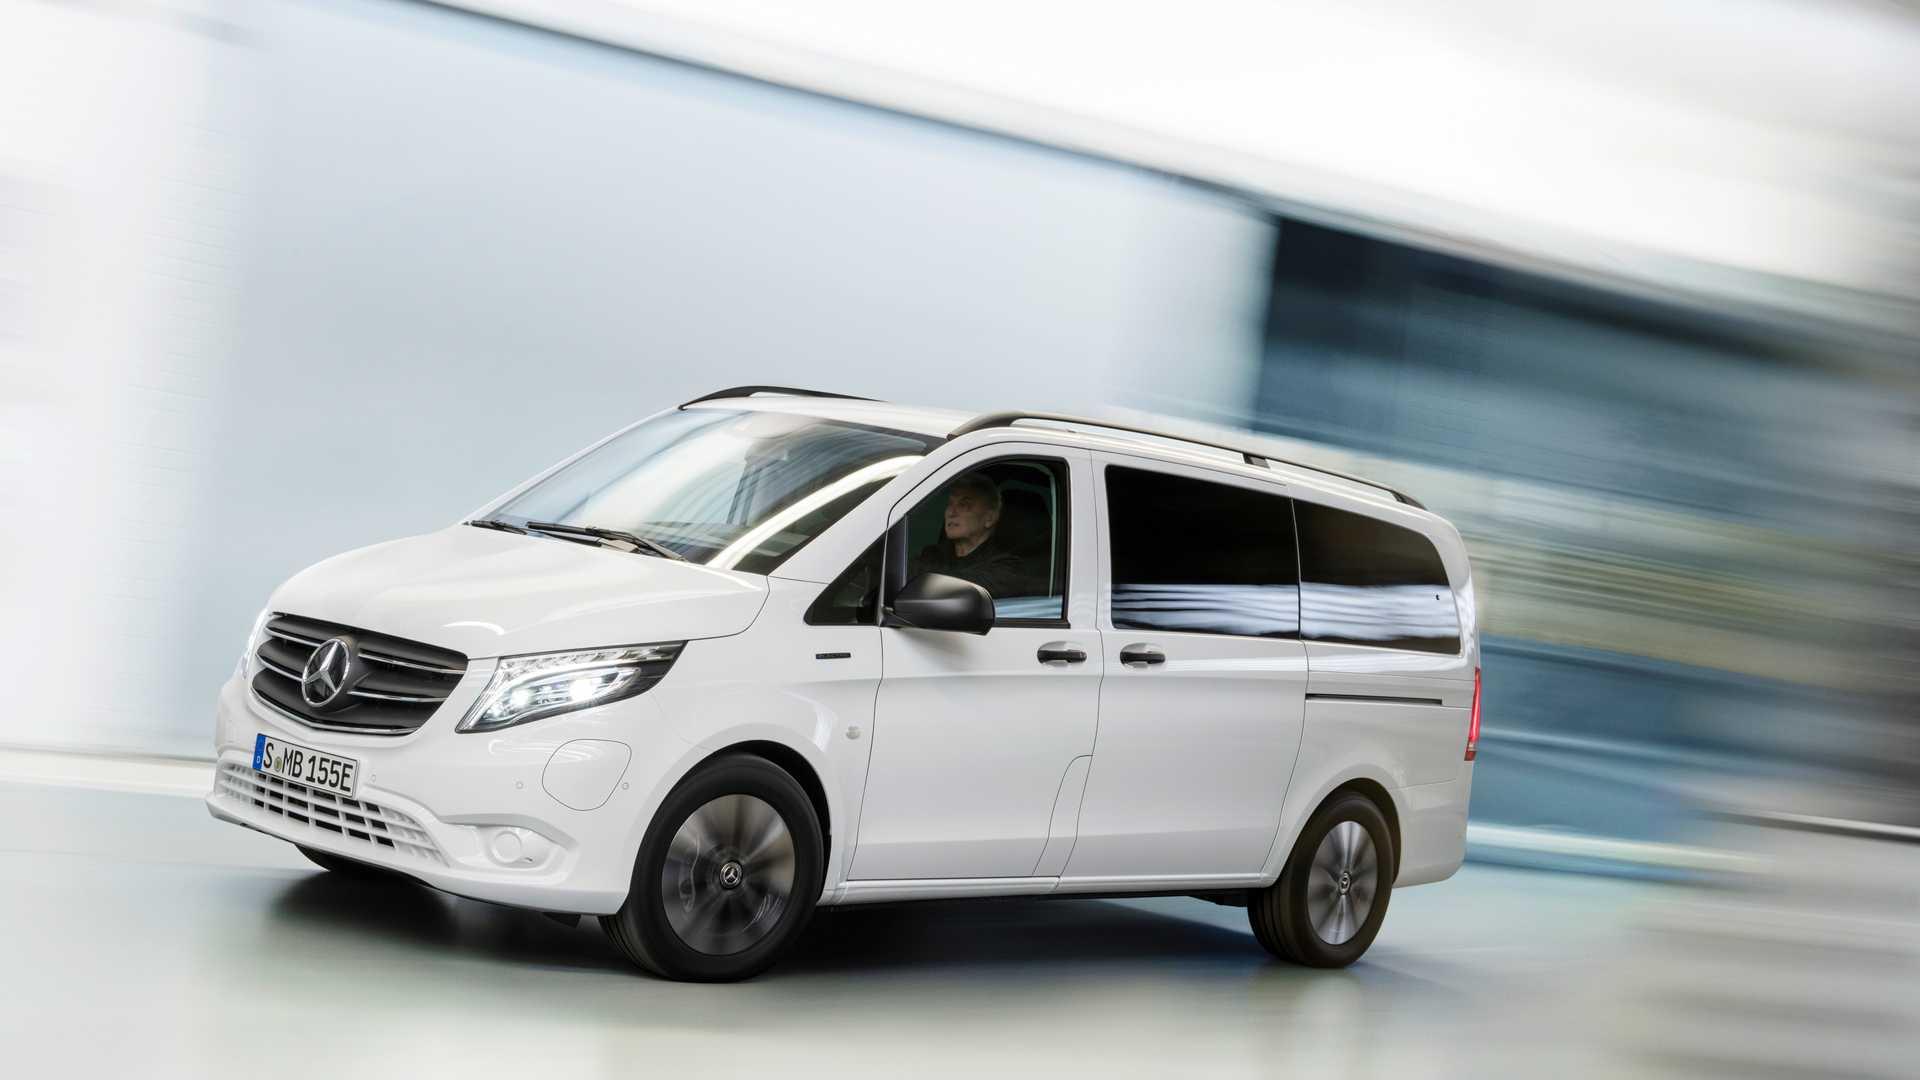 Mercedes-Benz eVito 2020 - elektryczny